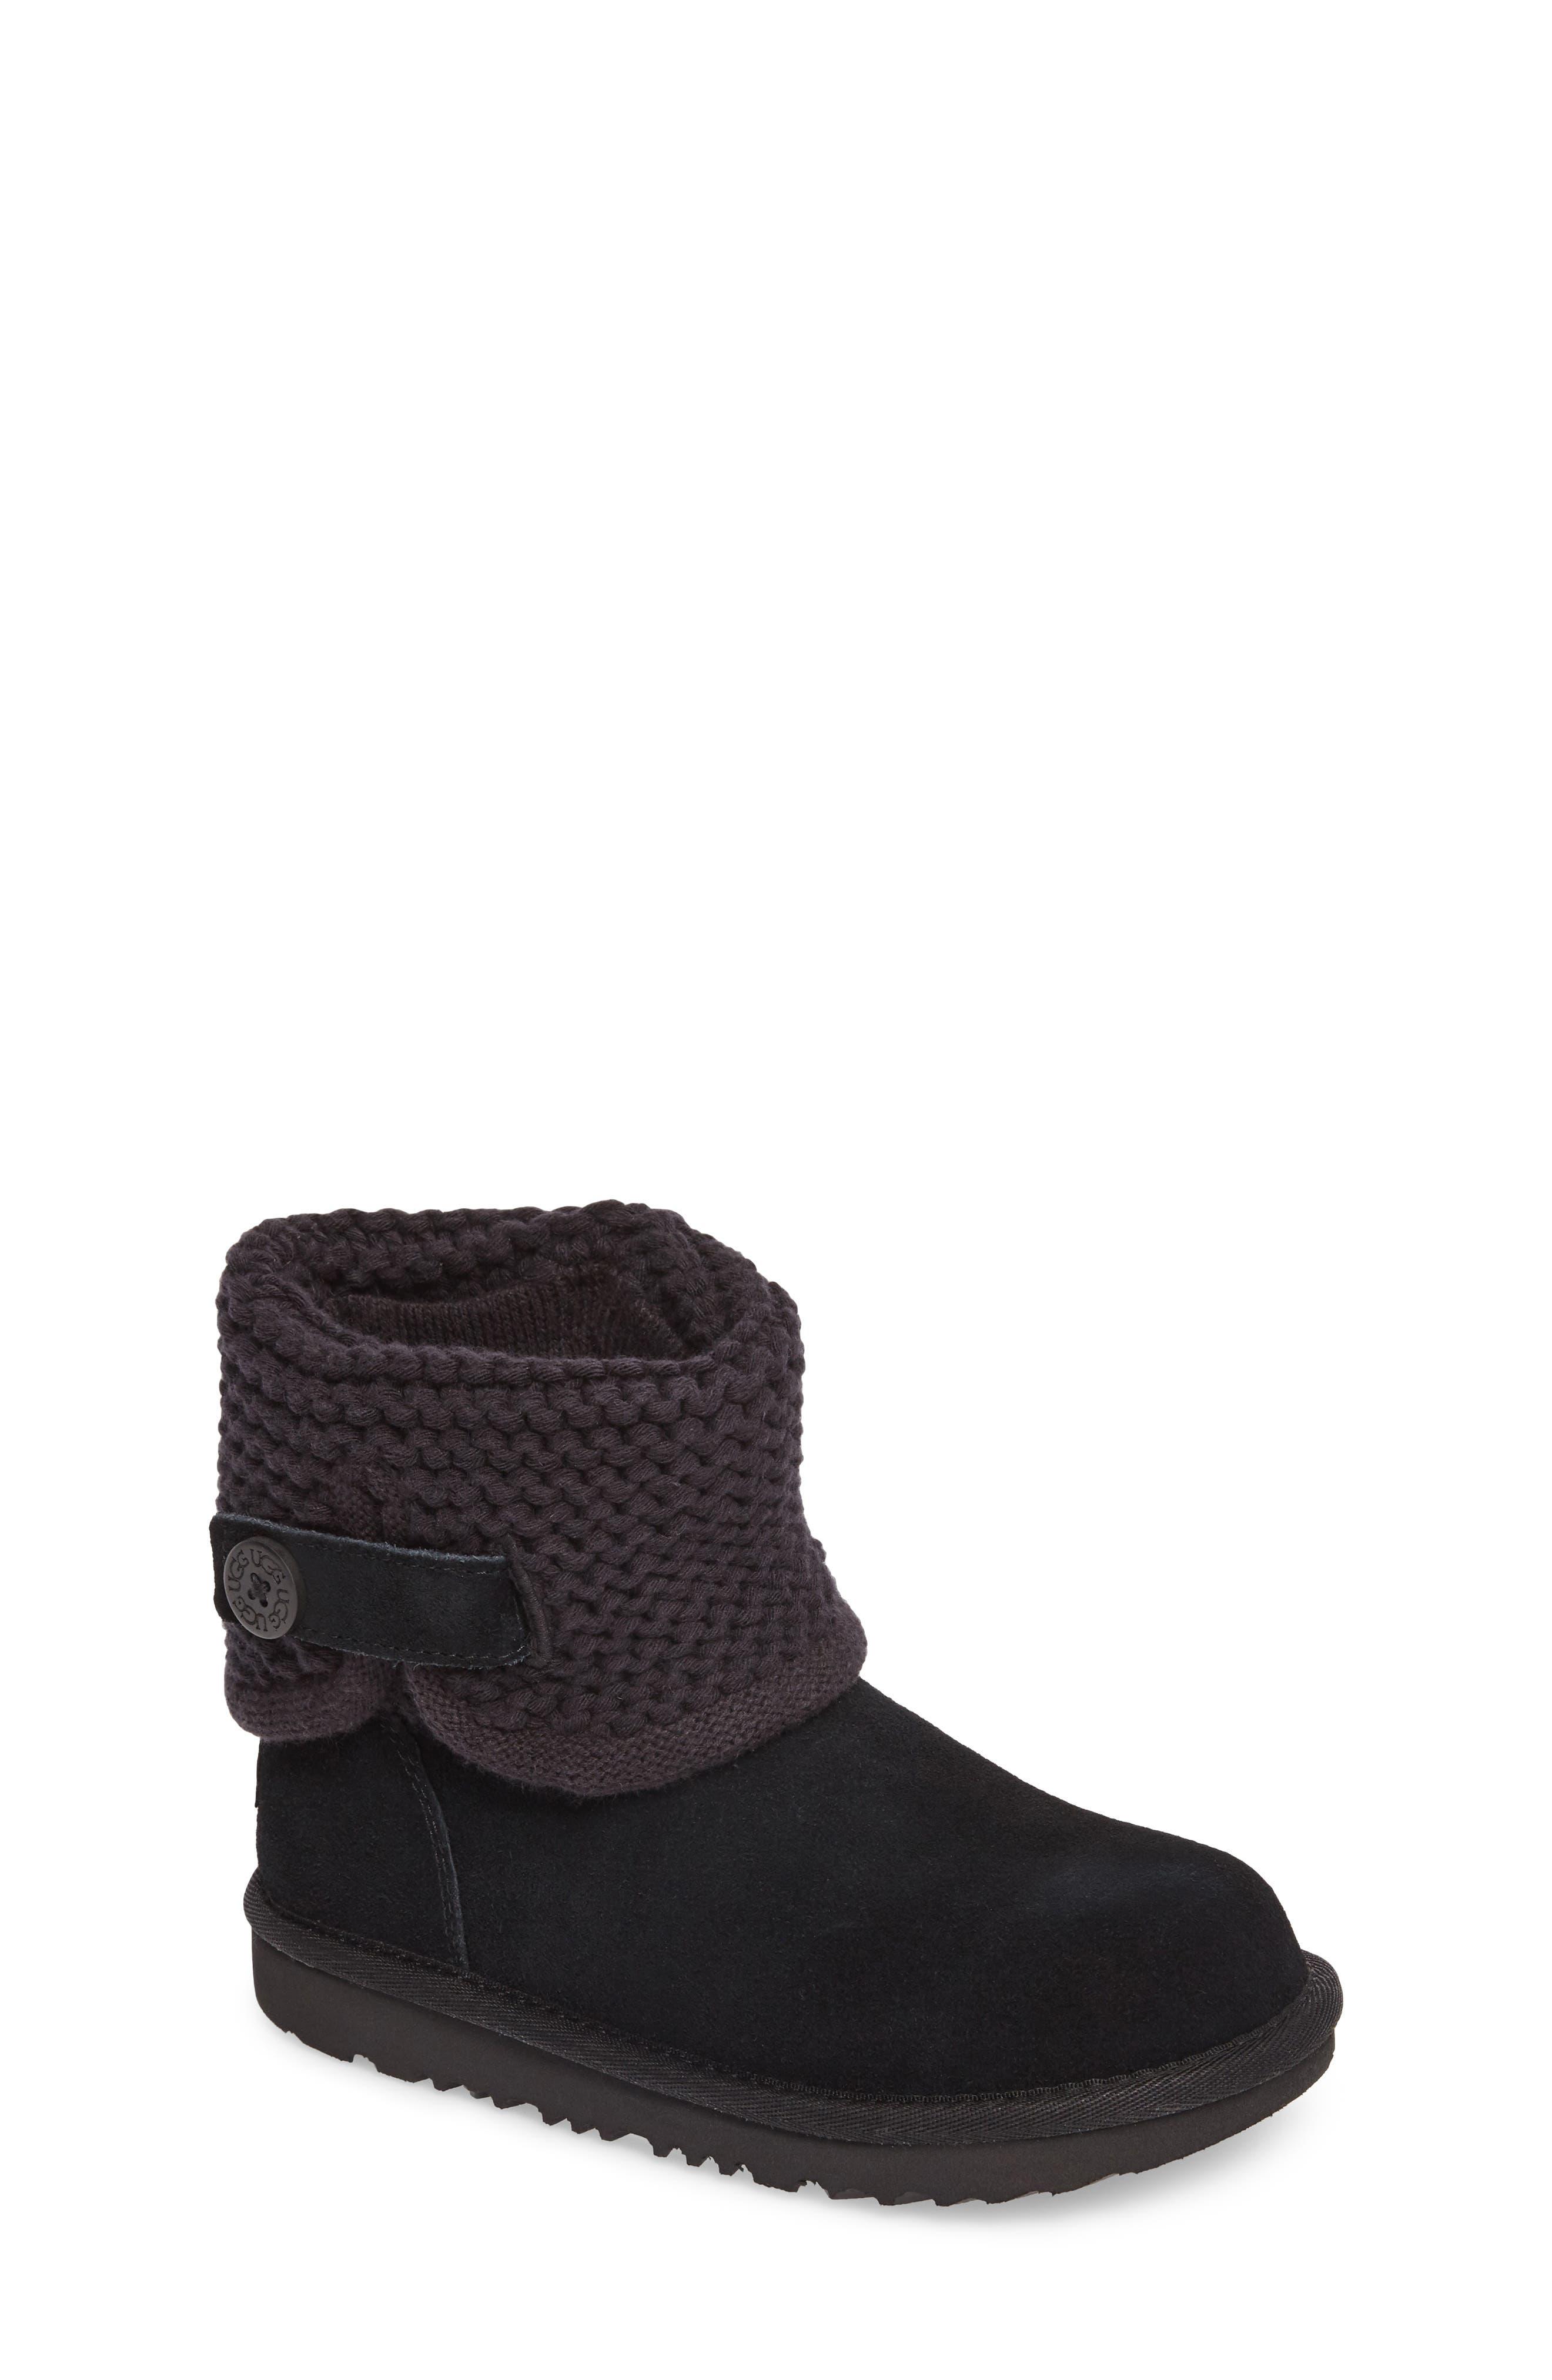 Darrah II Knit Cuff Boot,                             Main thumbnail 1, color,                             001